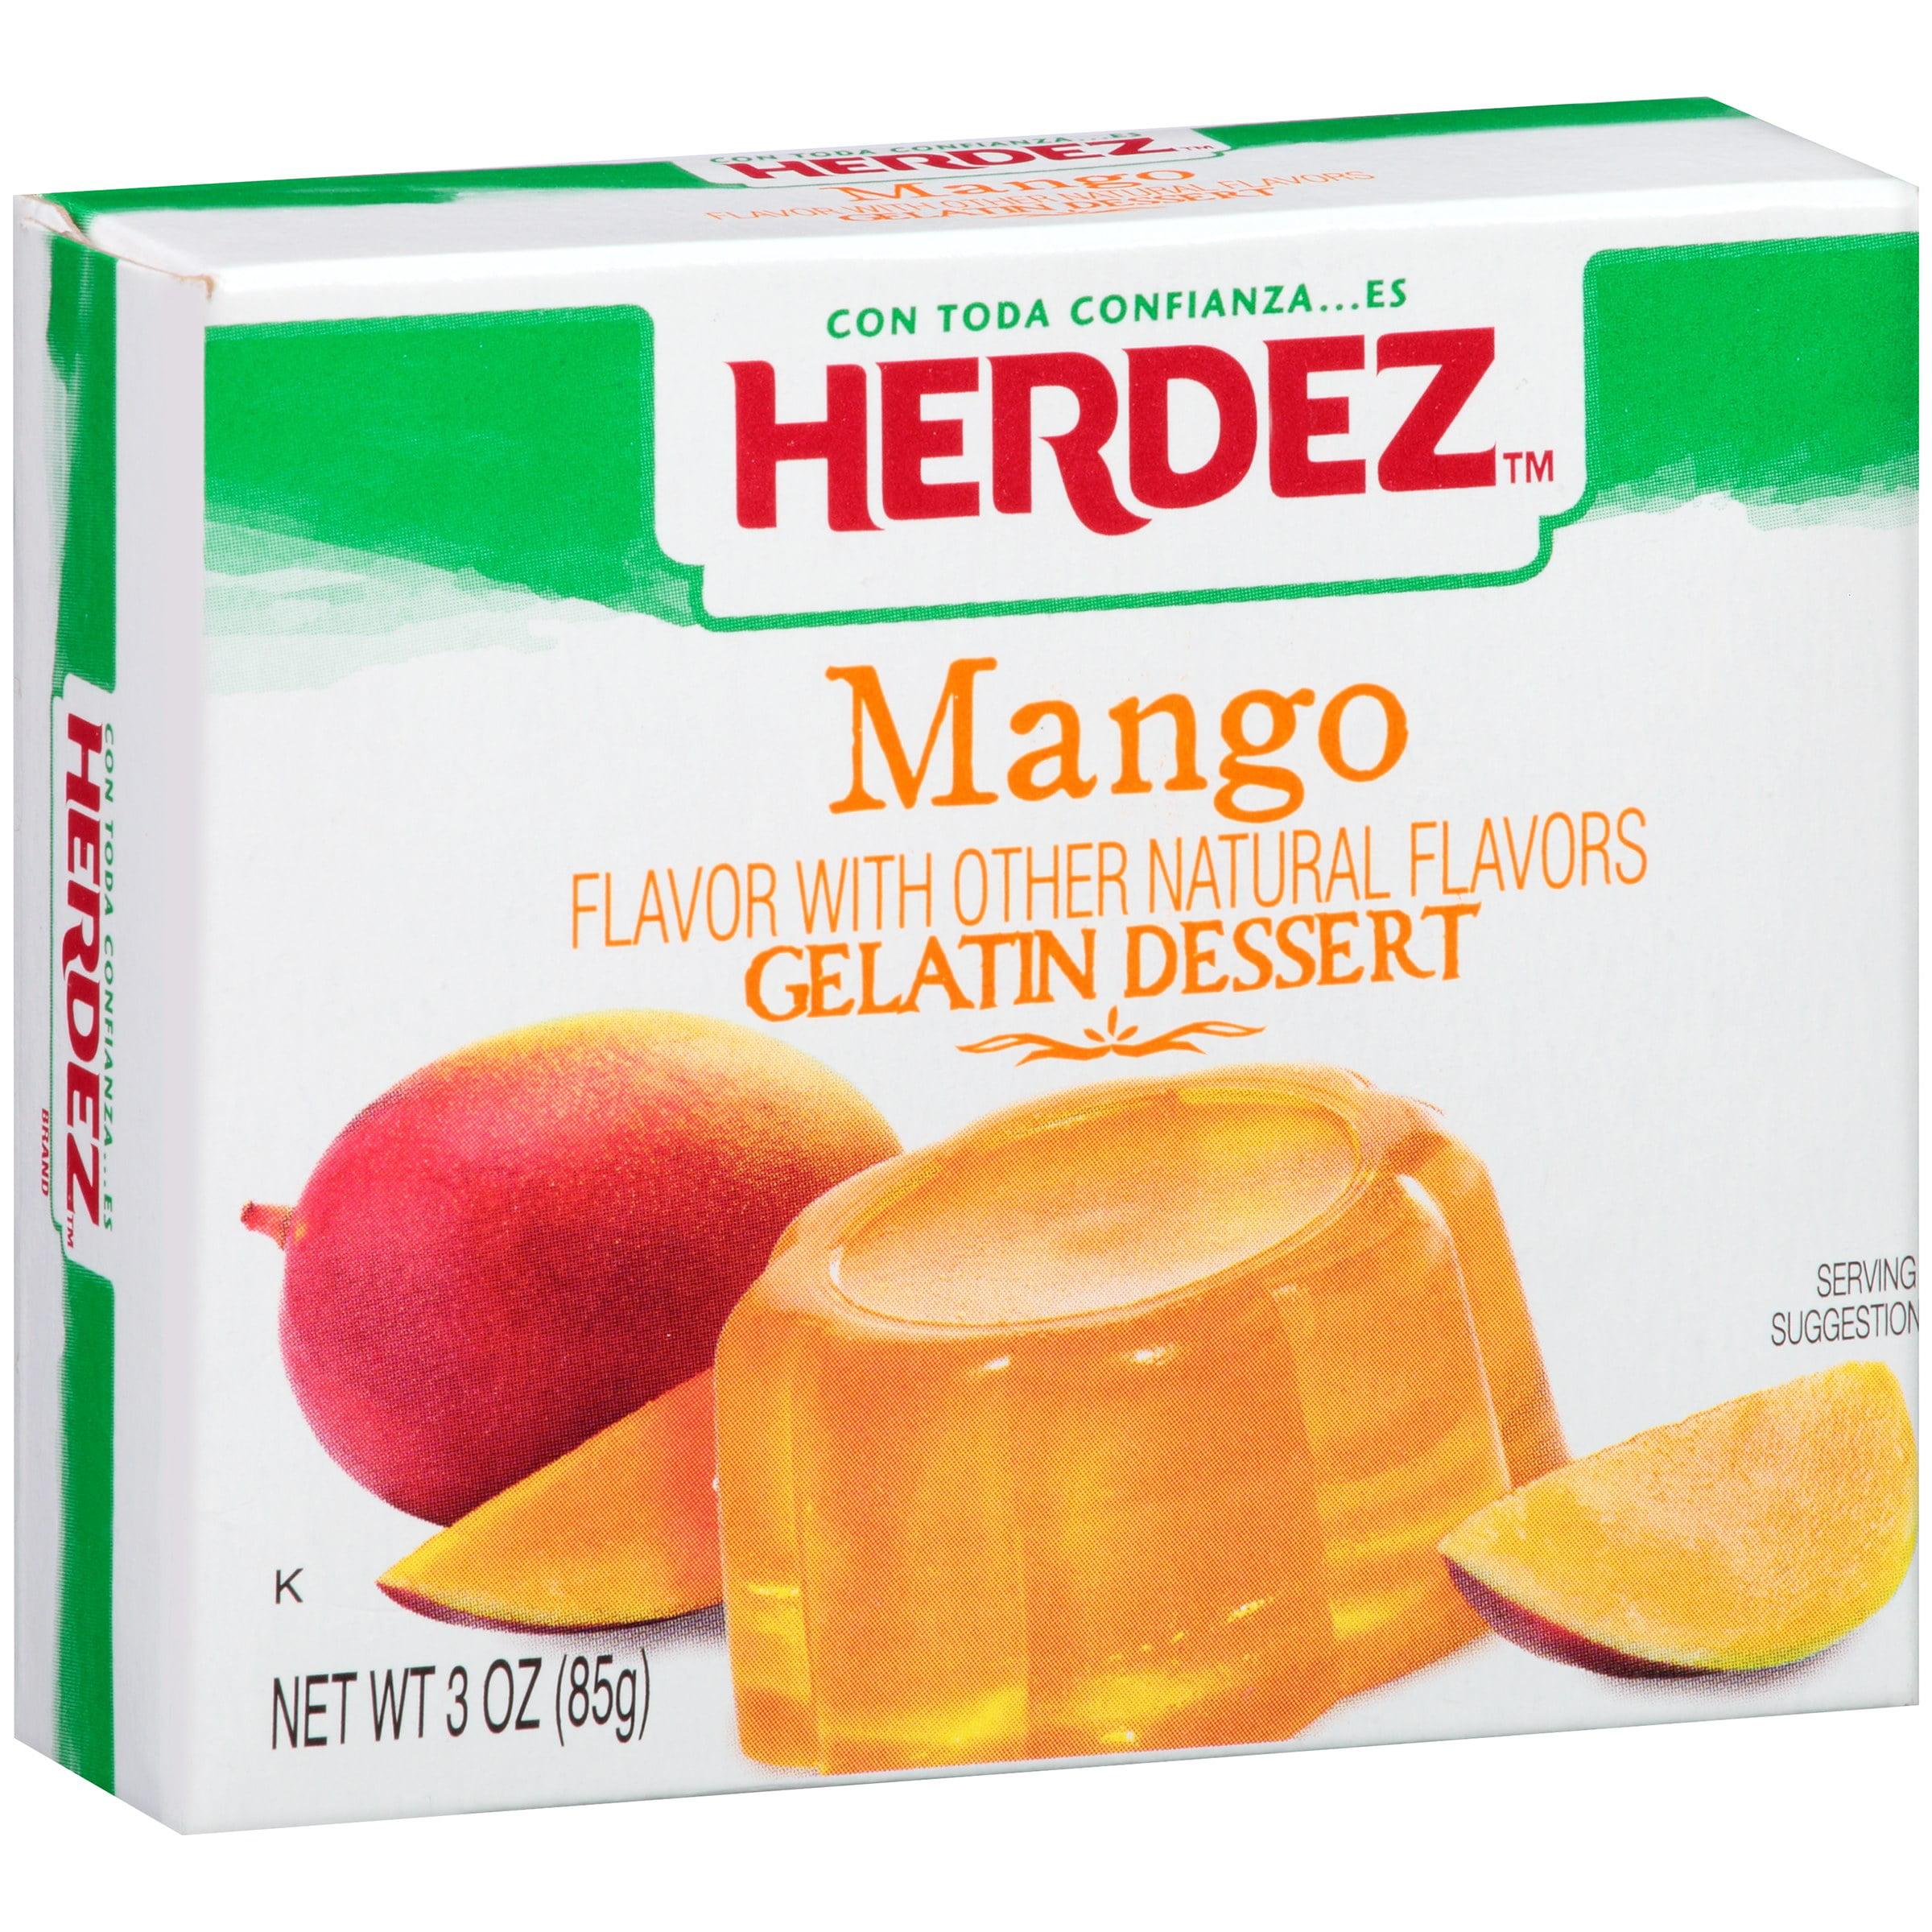 Herdez Mango Gelatin Dessert 3 oz. Box